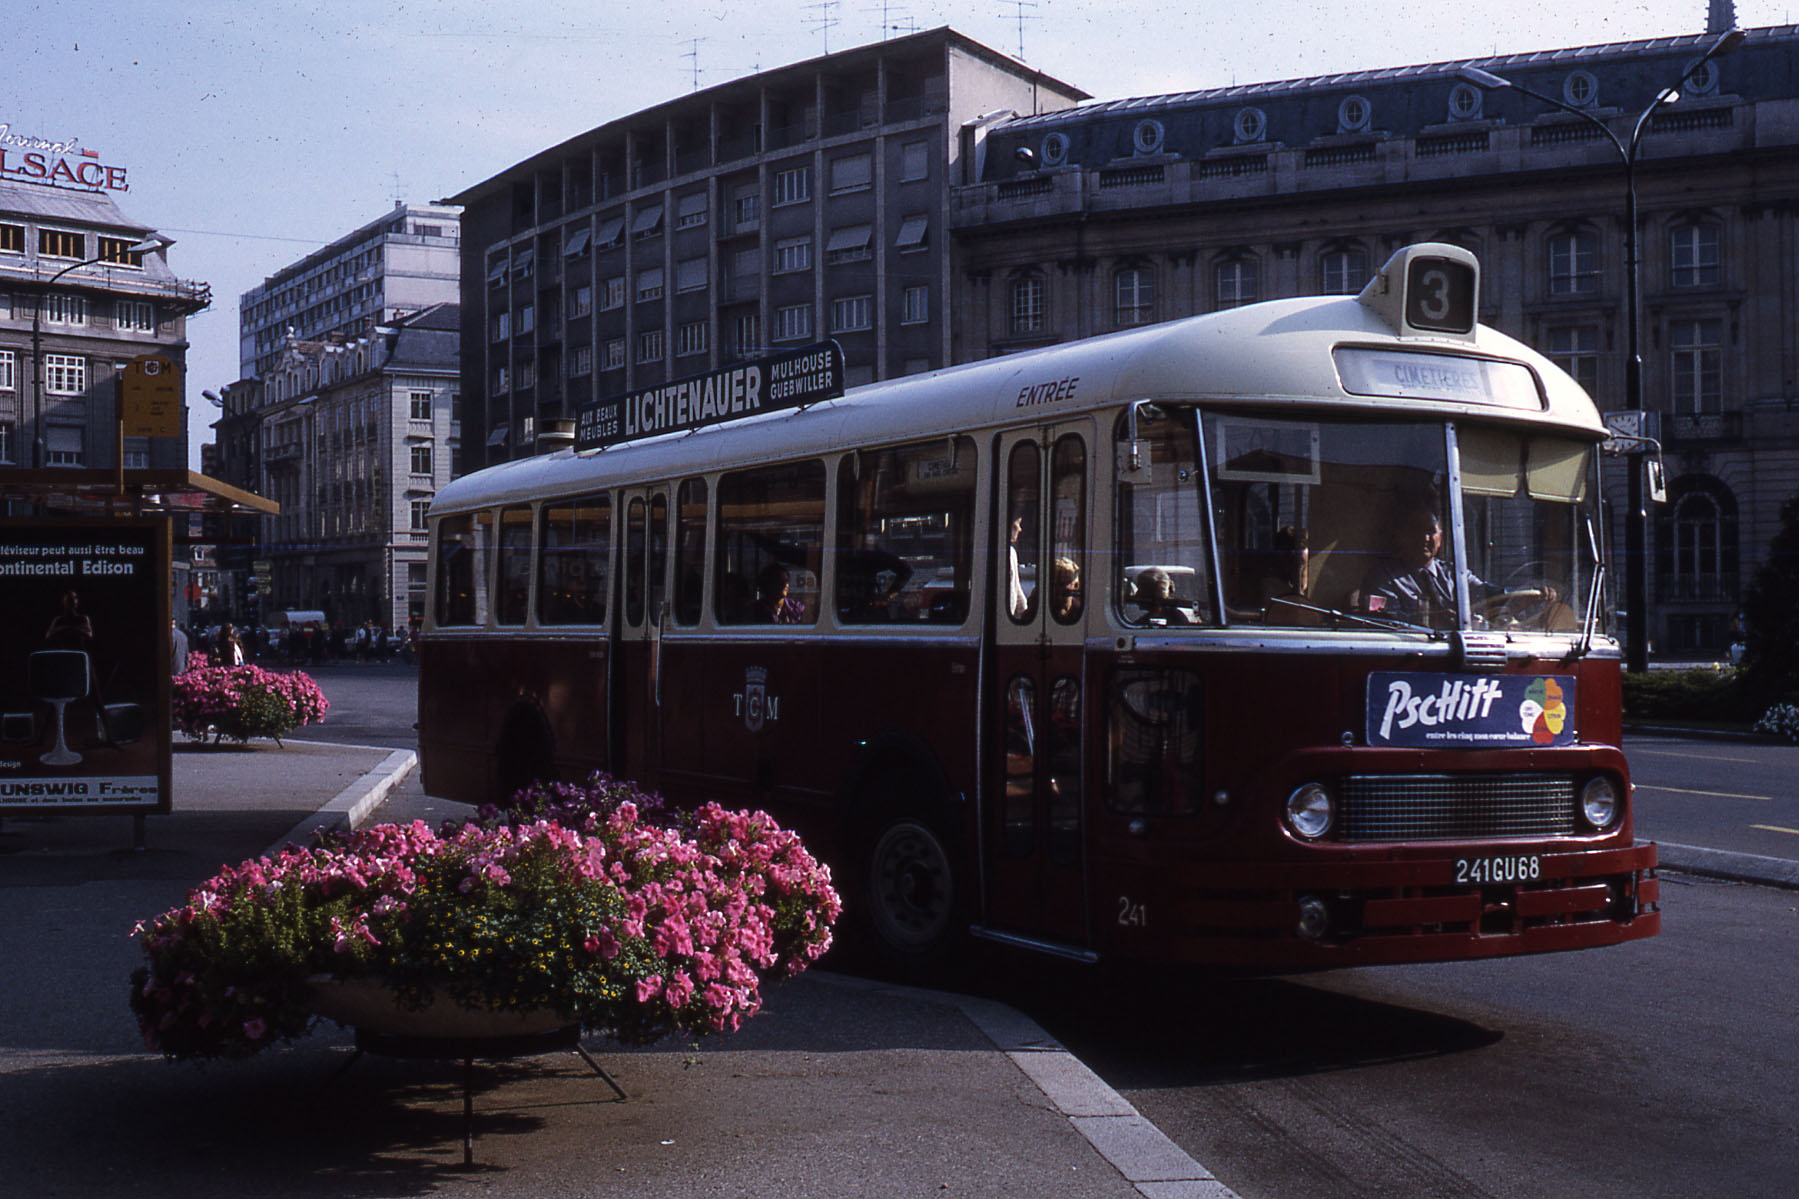 file jhm 1971 1090 mulhouse bus wikimedia commons. Black Bedroom Furniture Sets. Home Design Ideas